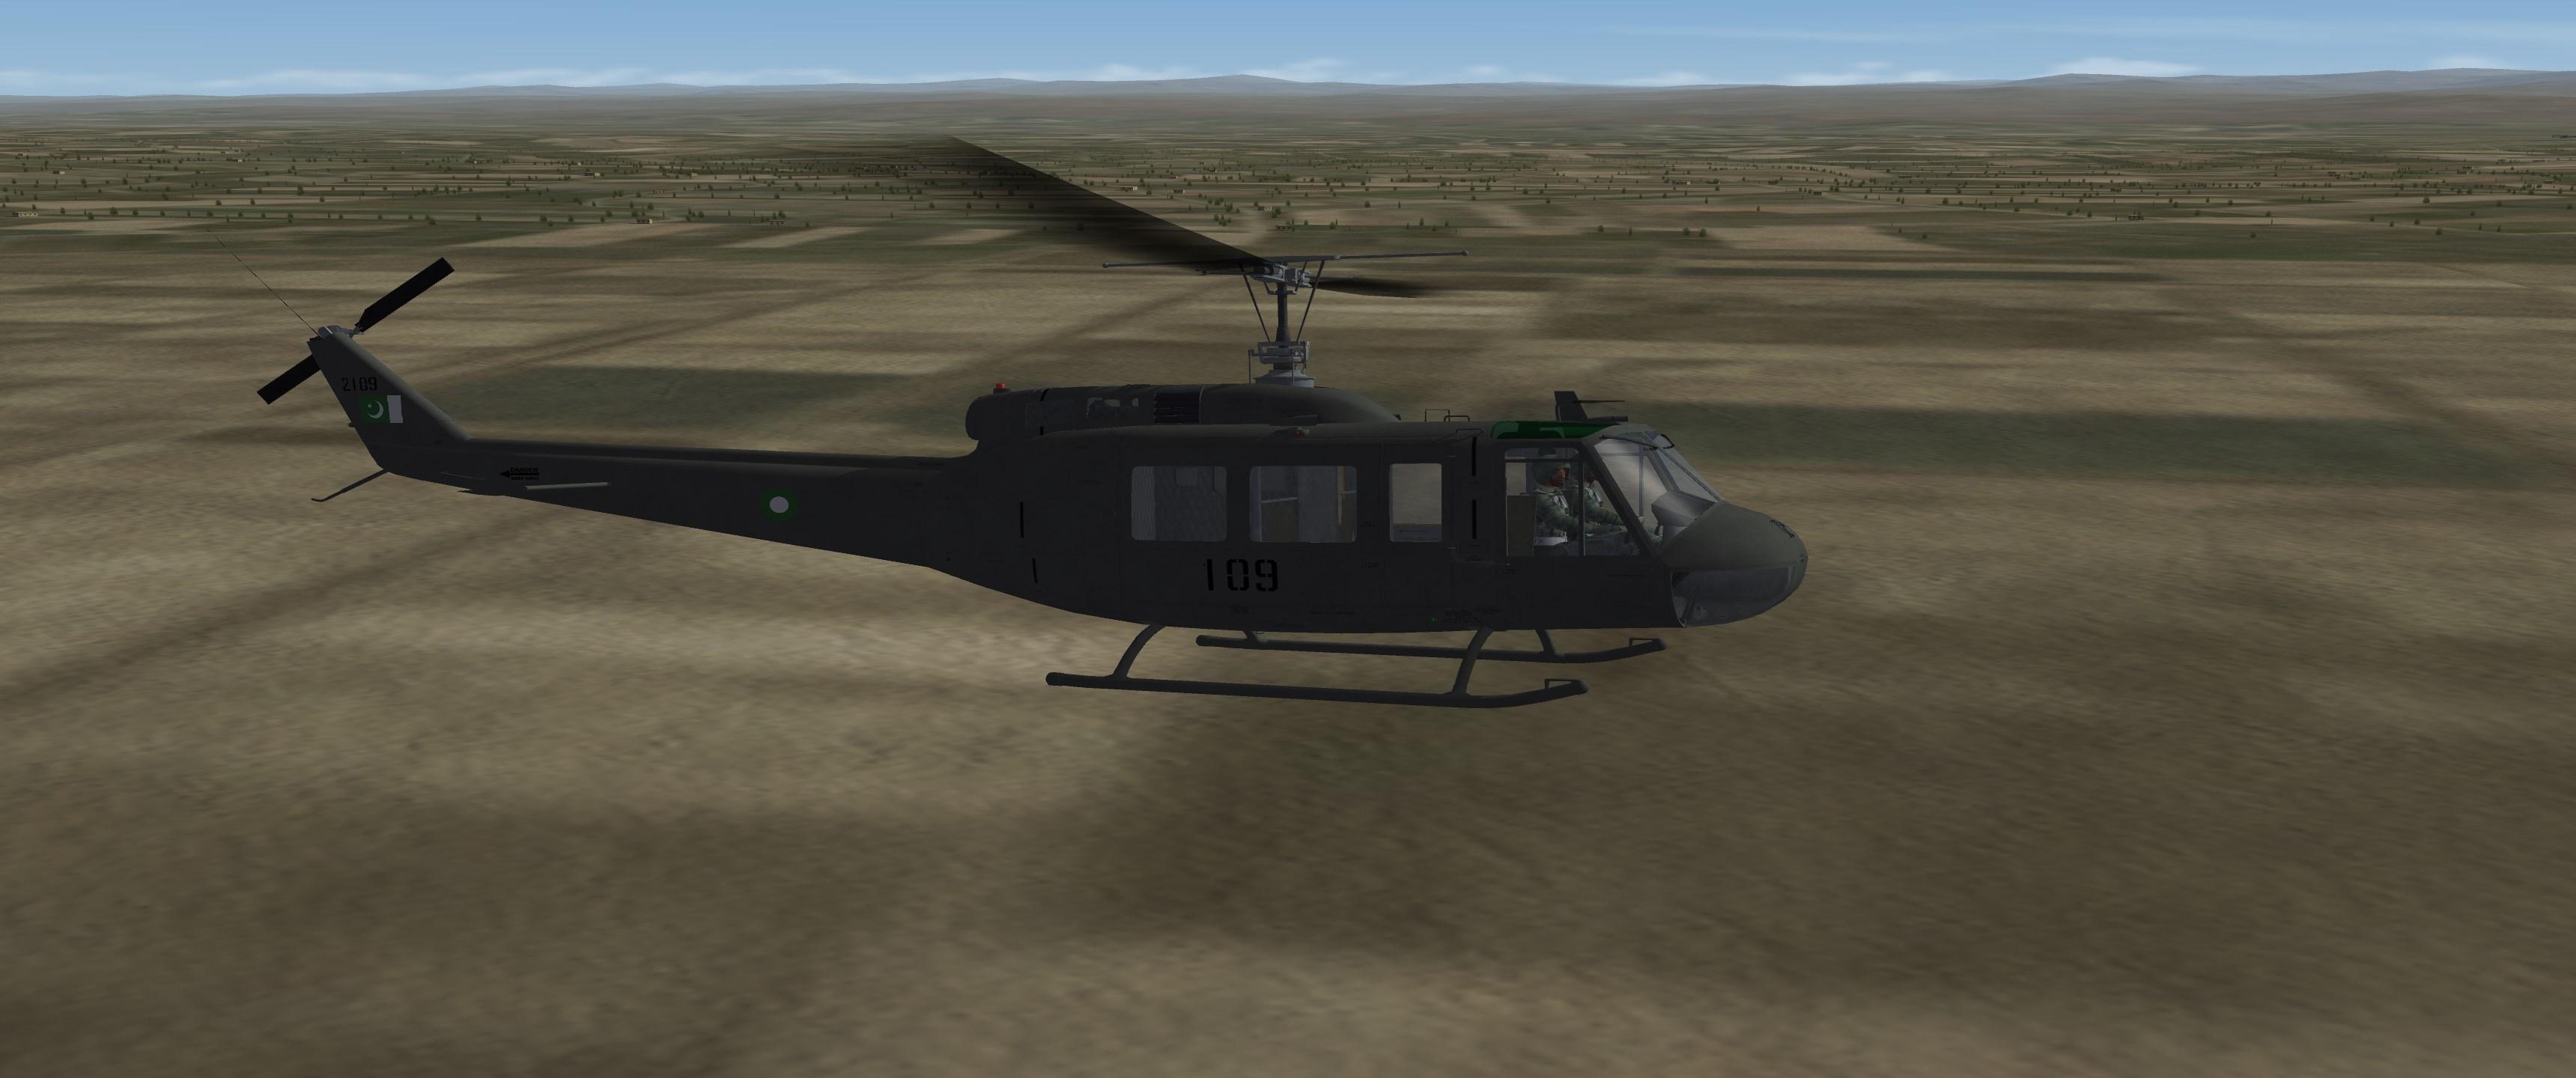 UH-1H IROQUOIS (PAKISTAN)